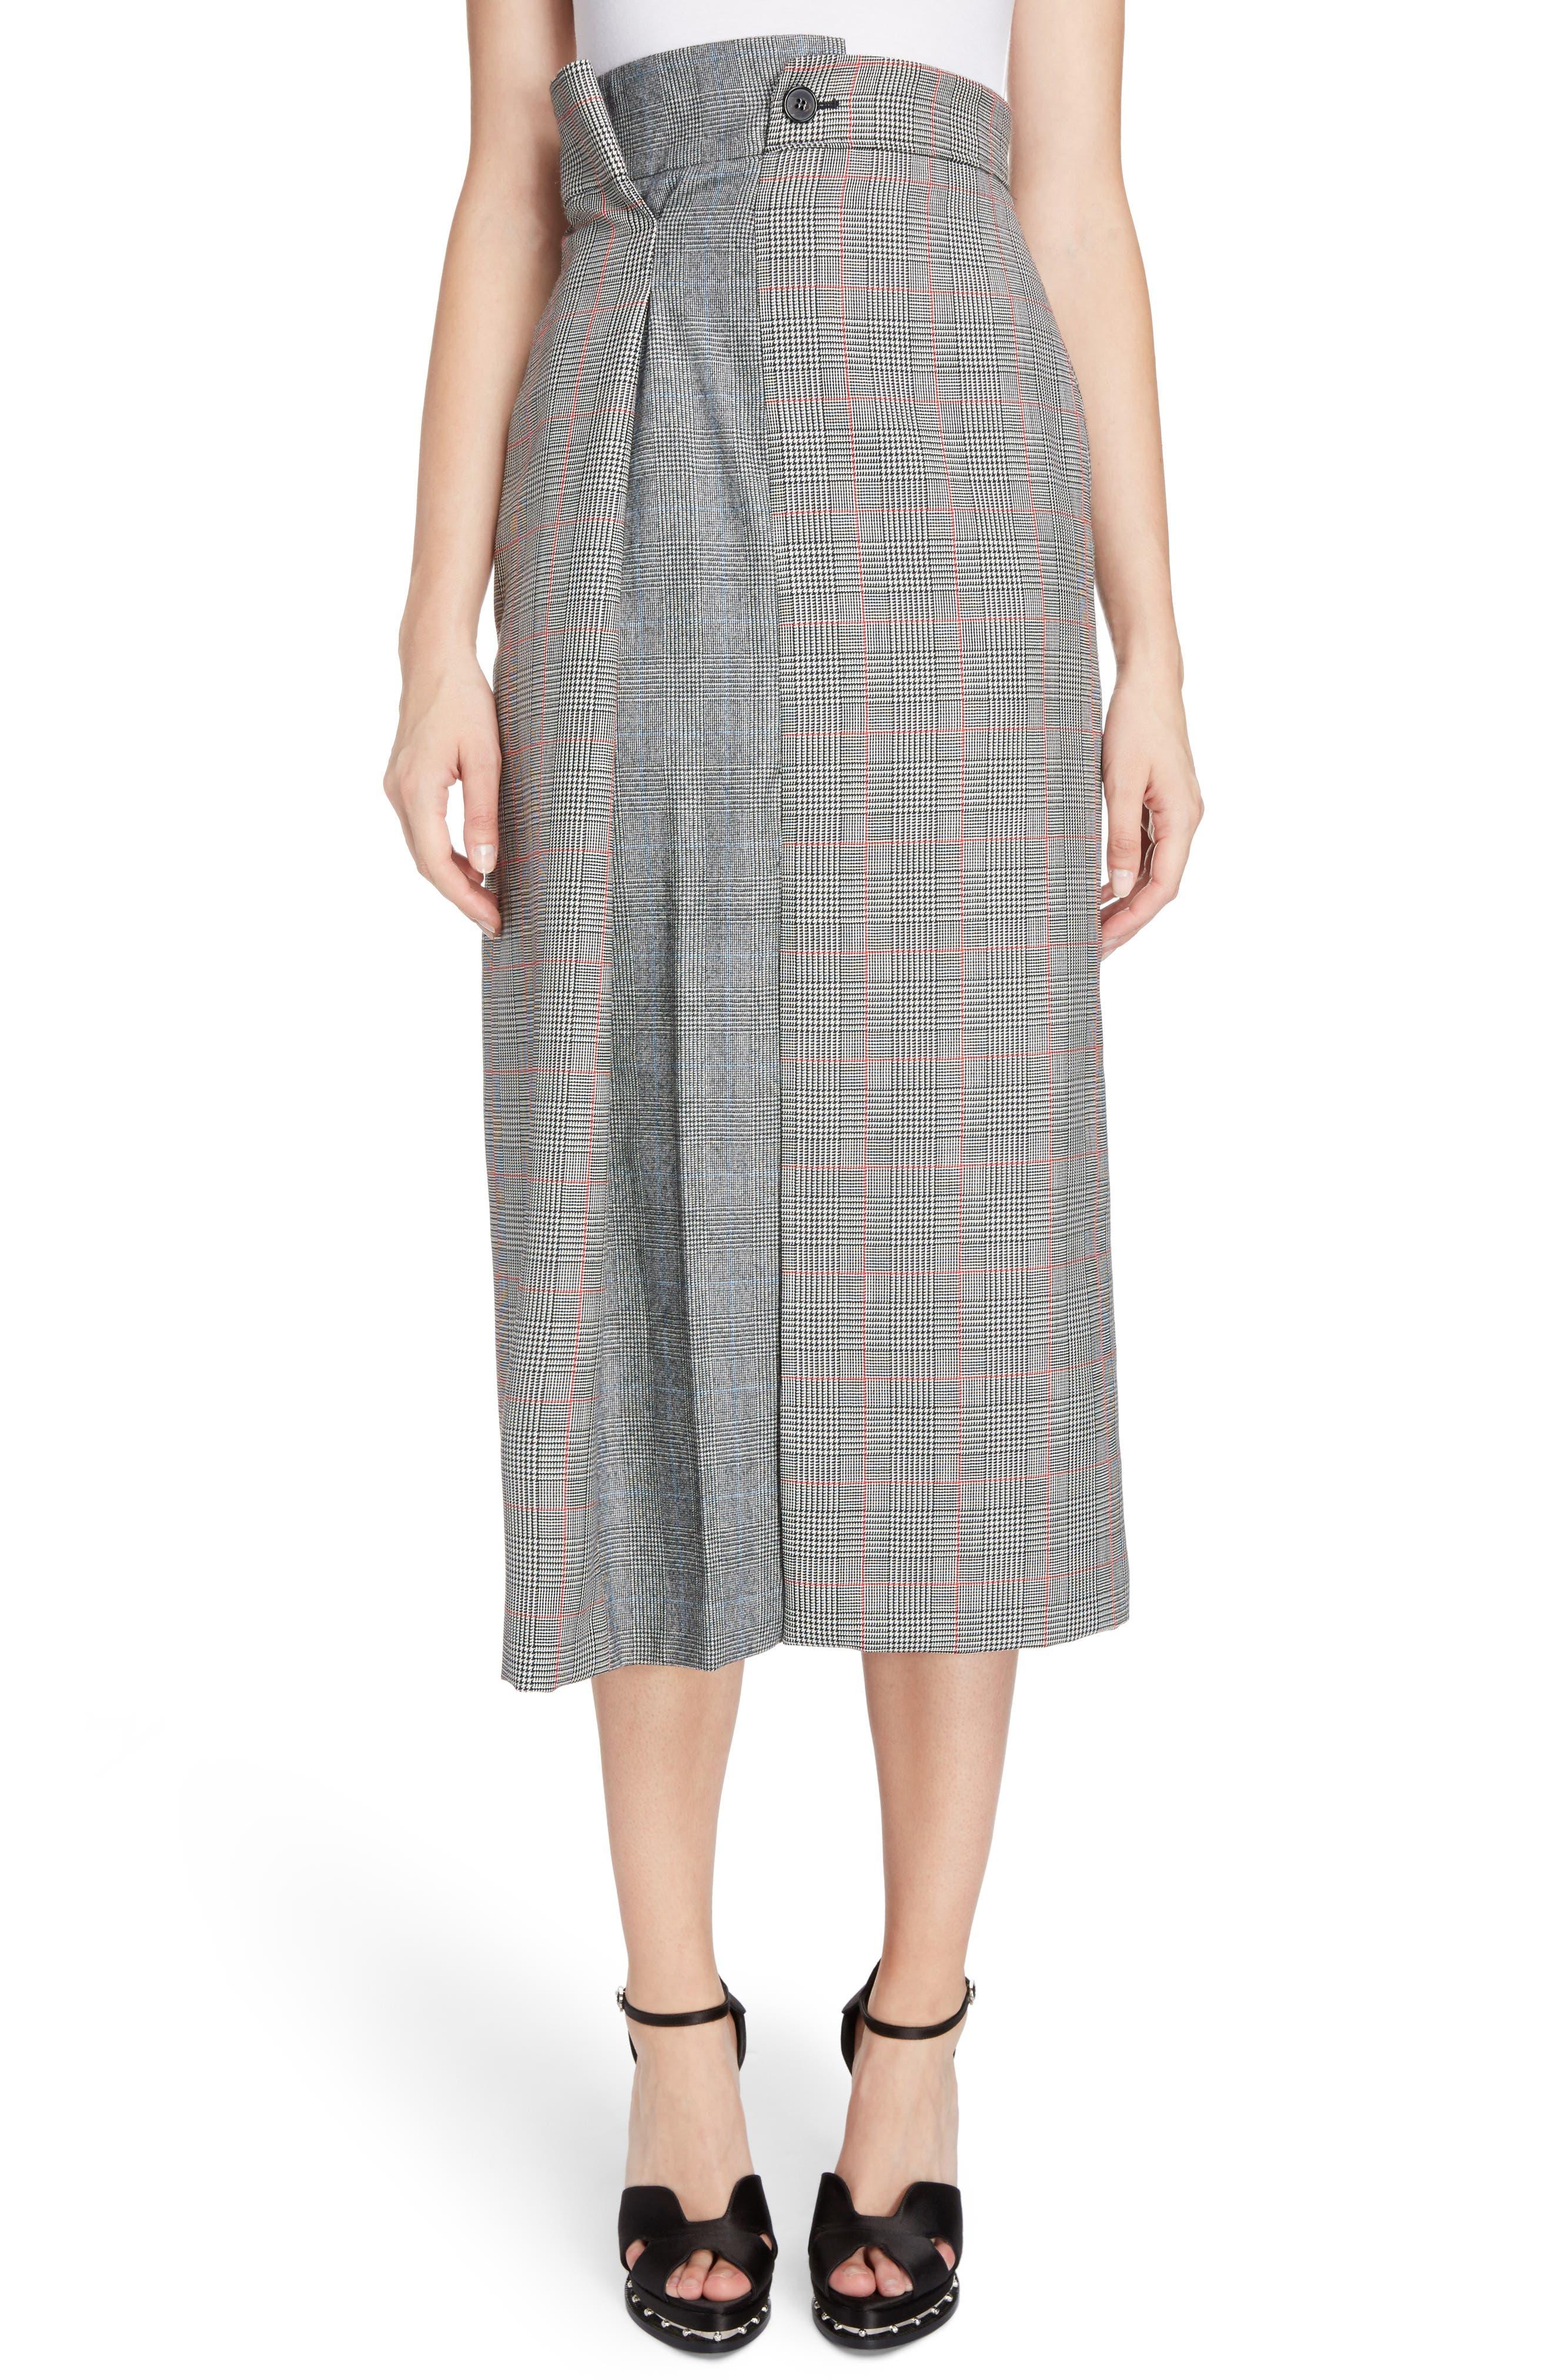 Prince of Wales Check Midi Skirt,                         Main,                         color, Black Ivory